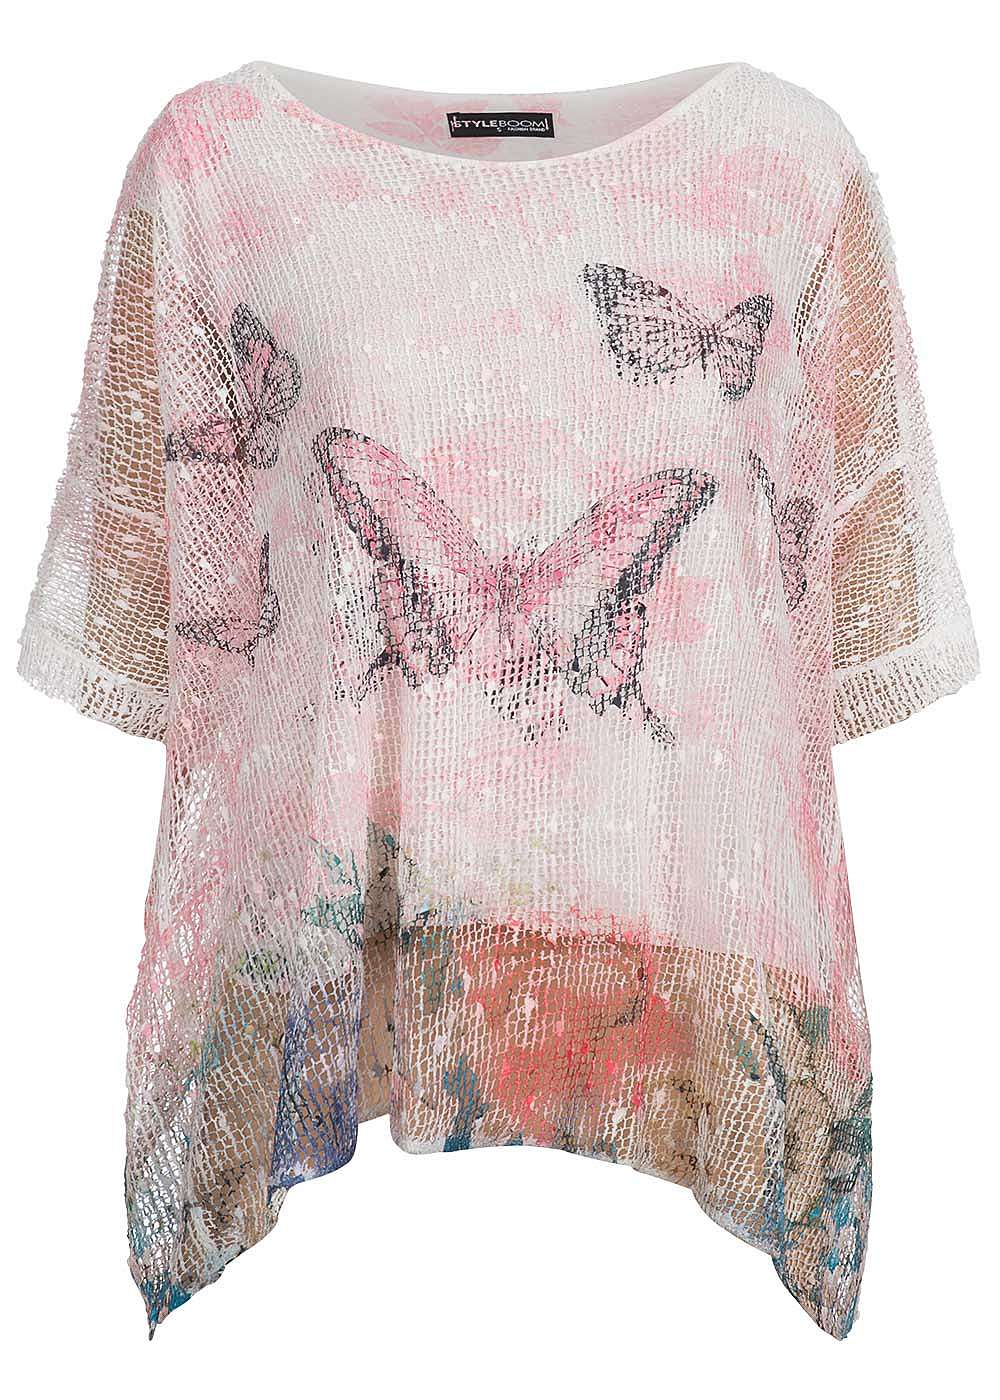 styleboom fashion damen shirt oversize 2 lagig netz optik pailletten rosa weiss 77onlineshop. Black Bedroom Furniture Sets. Home Design Ideas